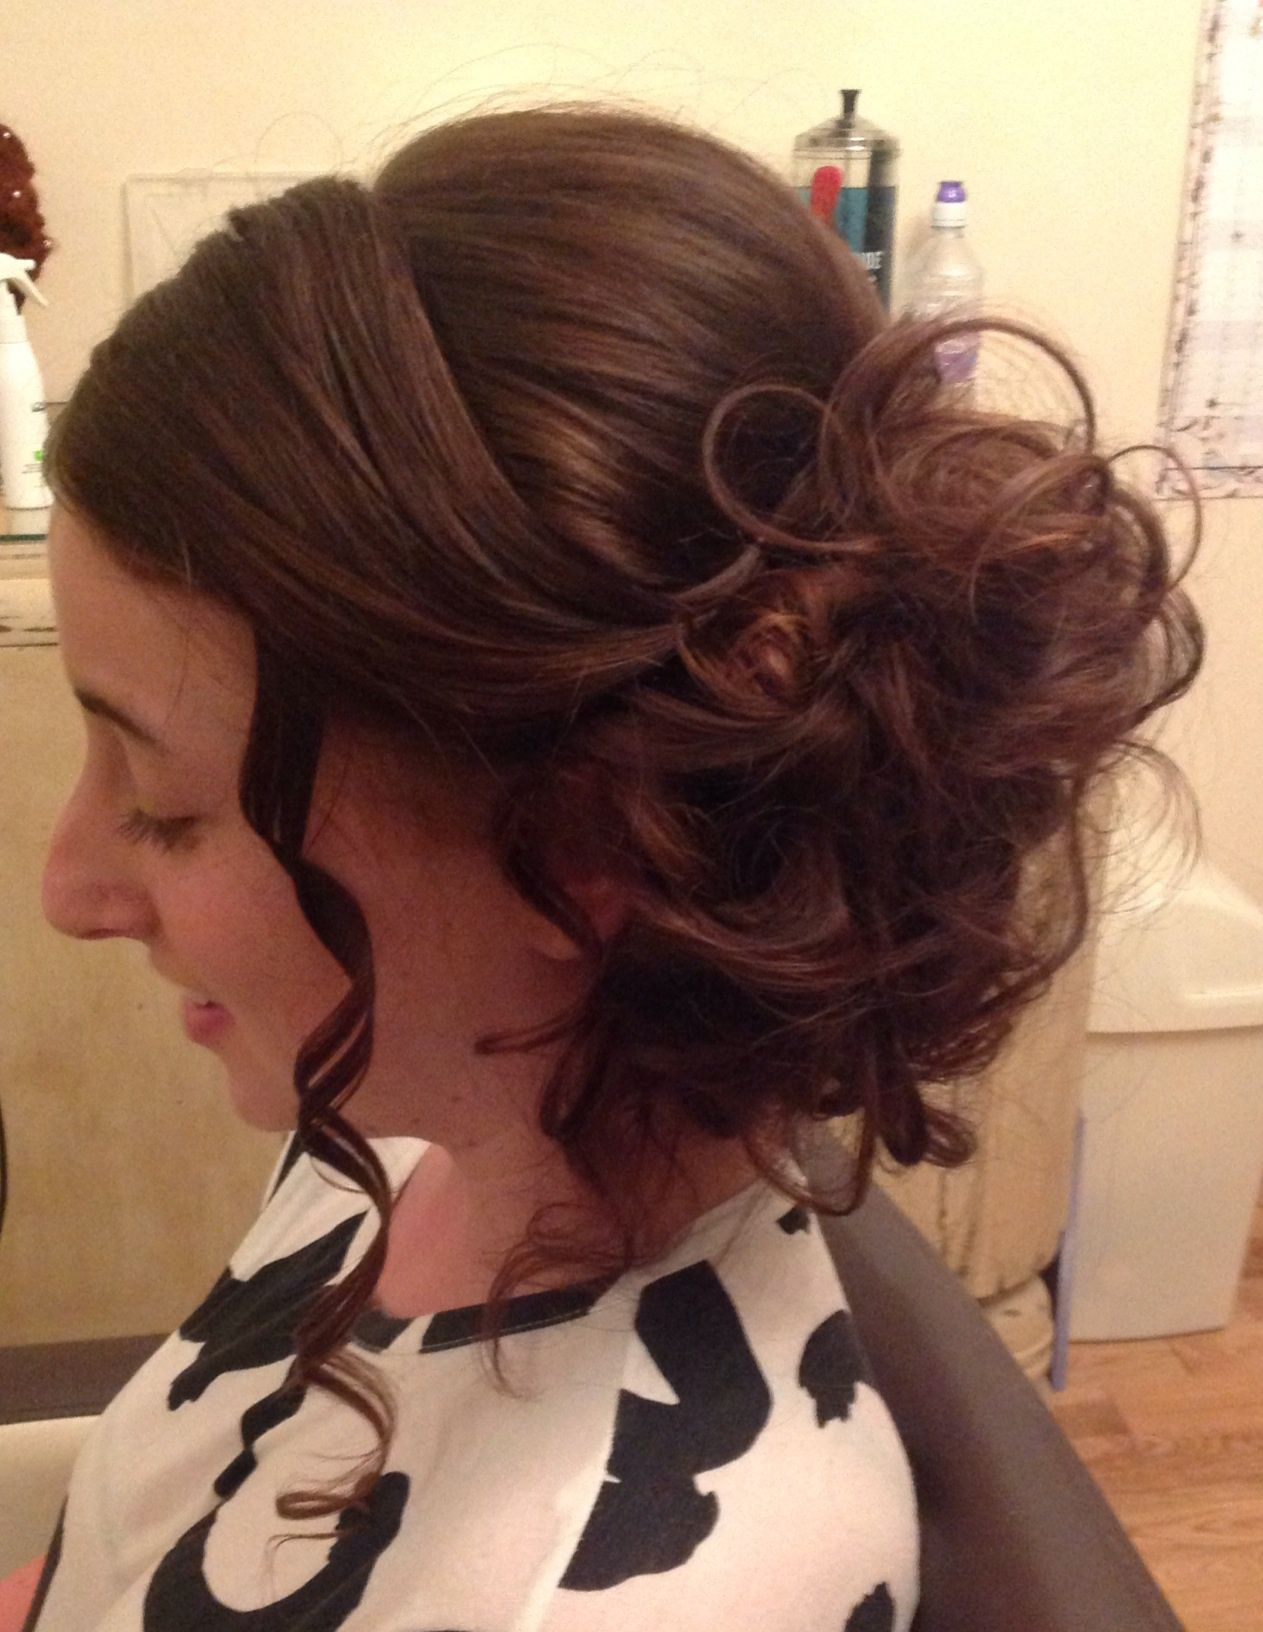 Messy curled side bun wedding hair style